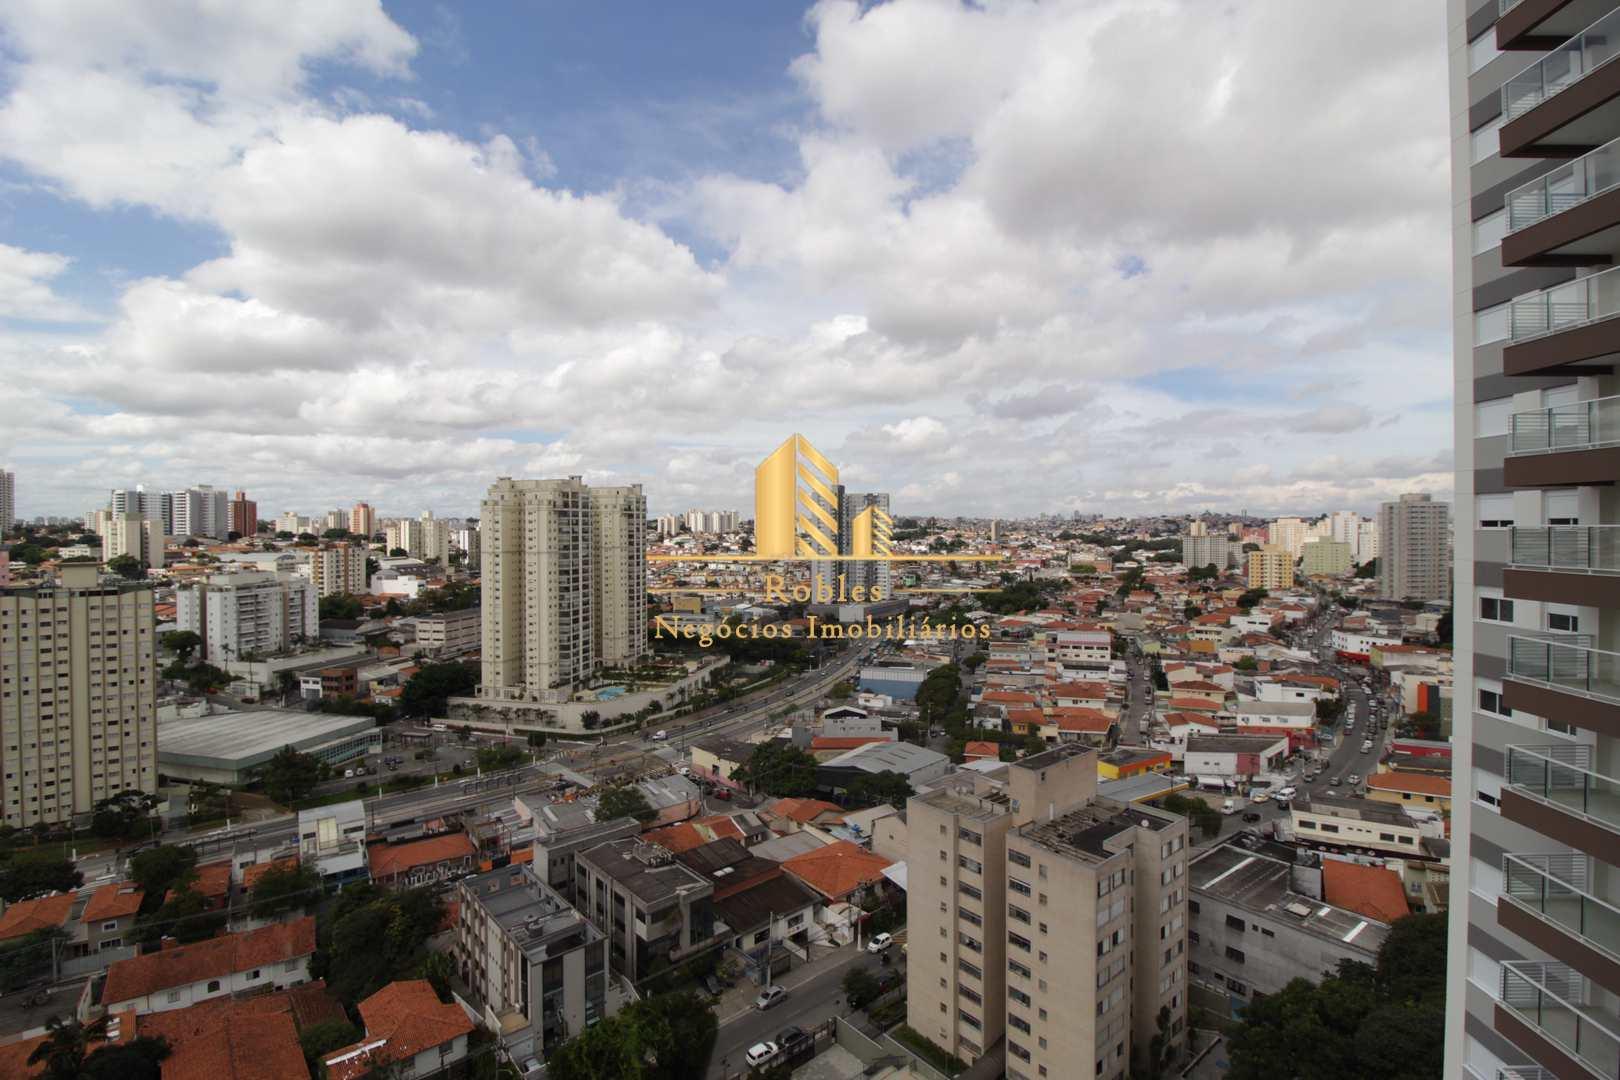 Apartamento com 2 dorms, Jardim Prudência, São Paulo - R$ 615 mil, Cod: 1872